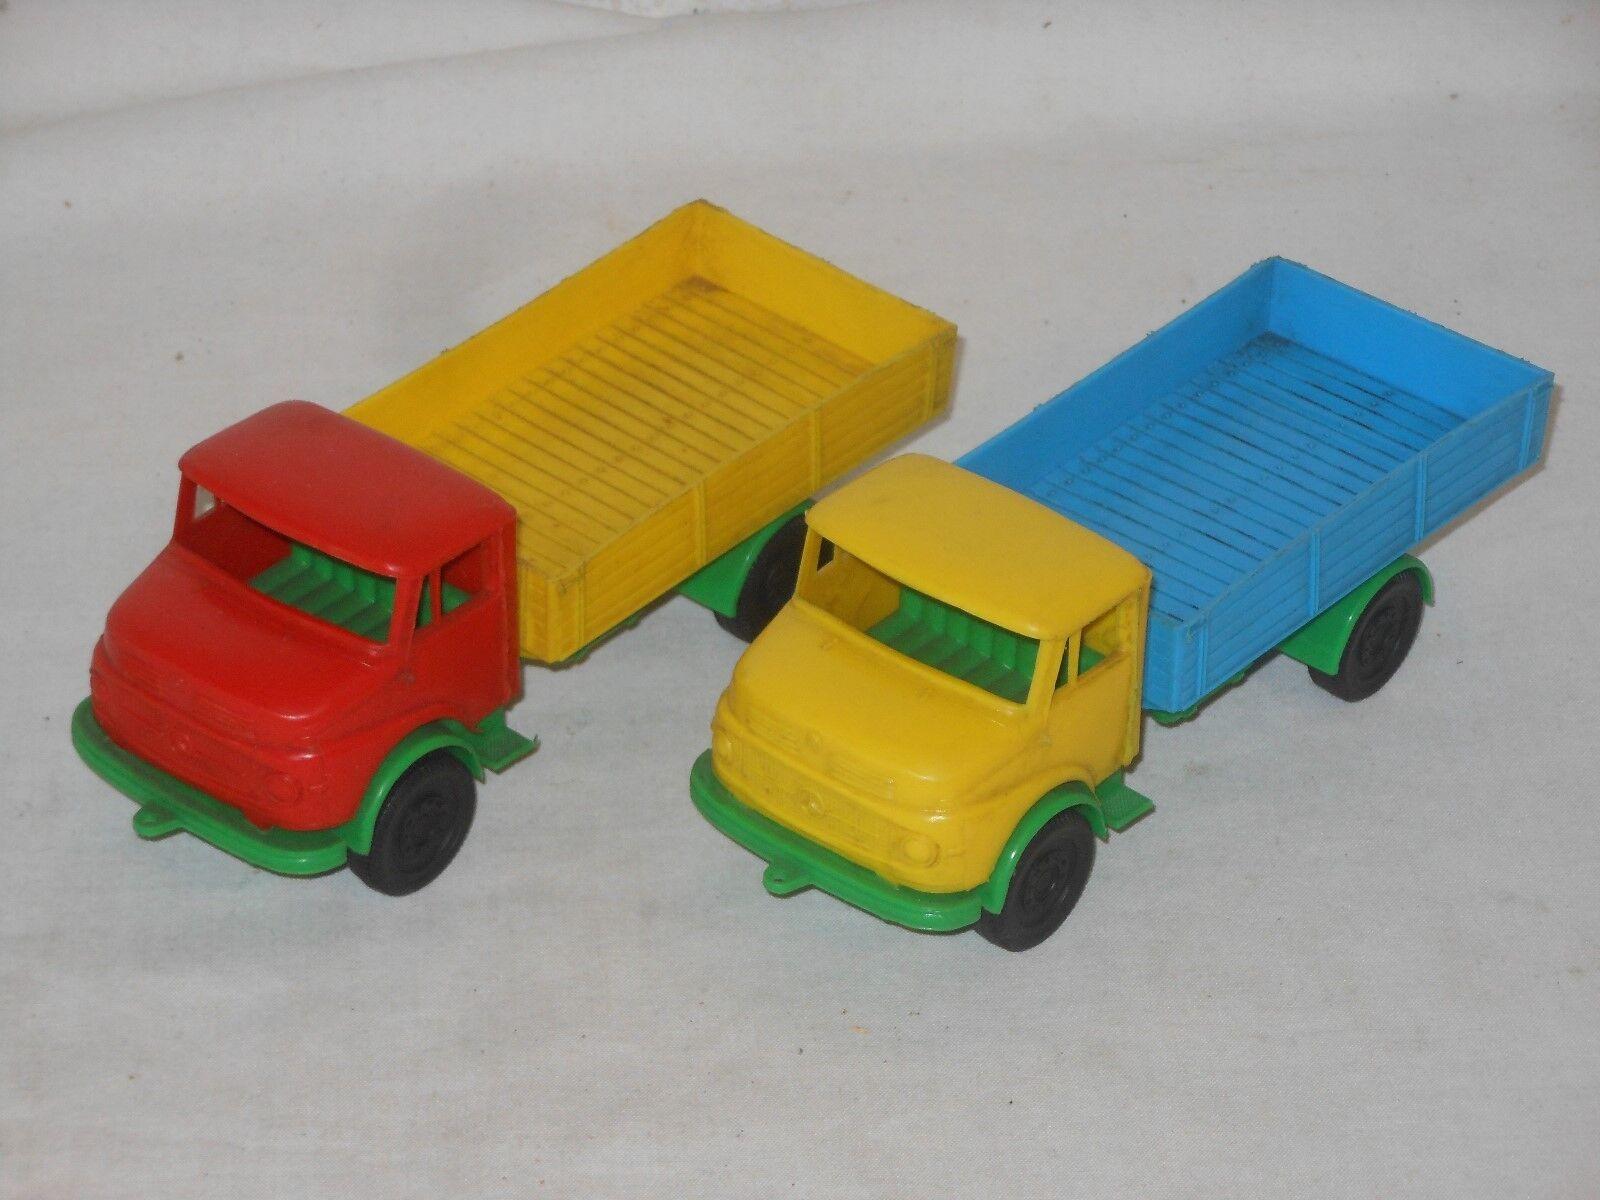 2 Pieces Mercedes Benz Short Hood - JA 16 cm - Vintage Toy - West Germany - 8